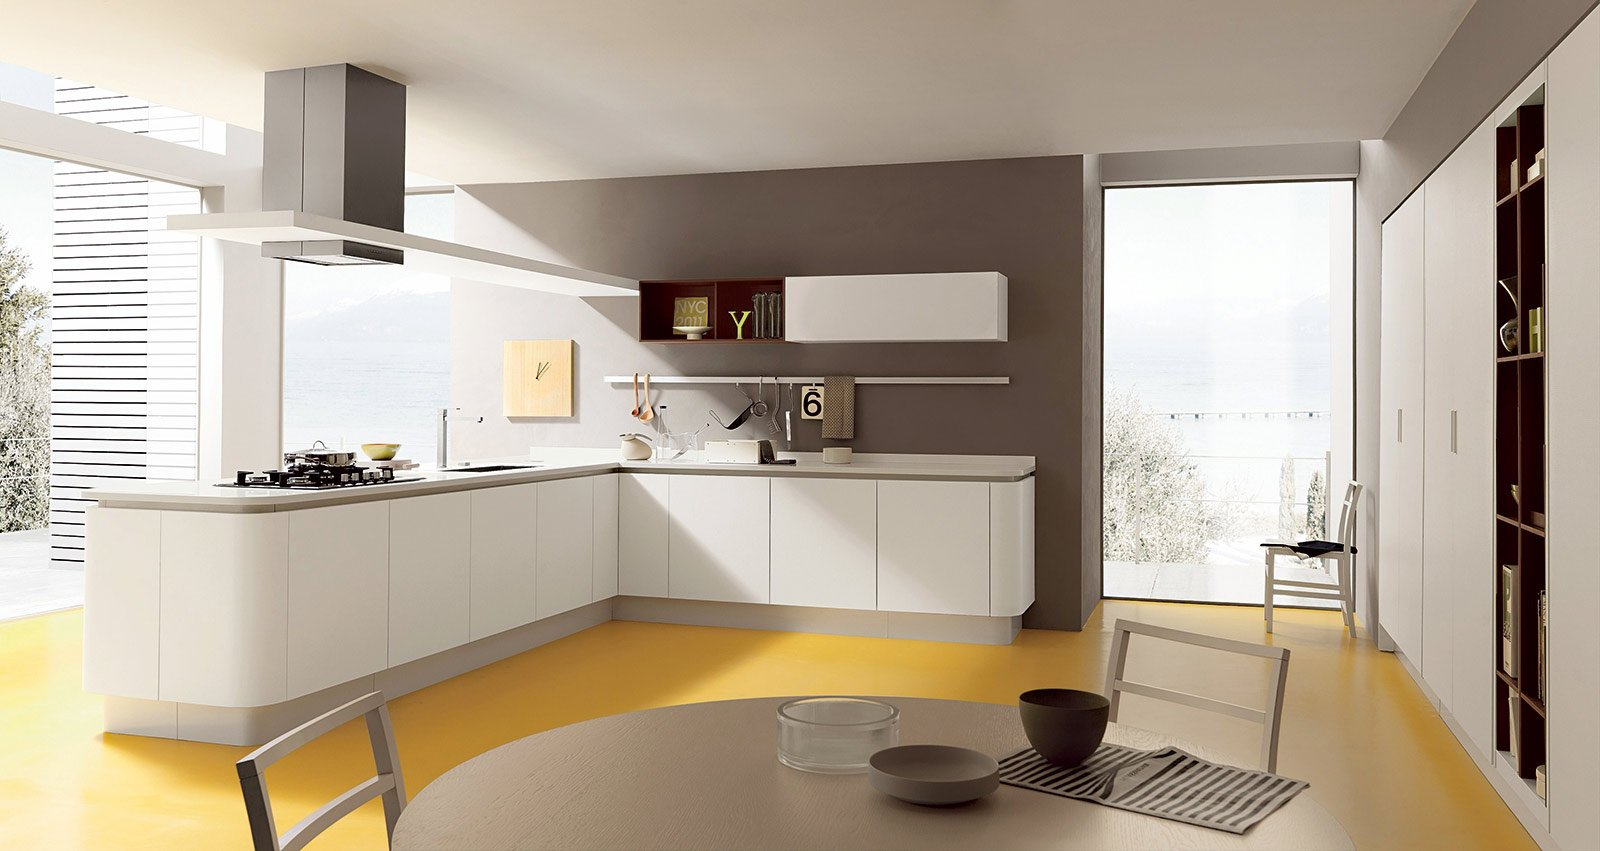 Cucina Bianca Cucina Con Cappa A Soffitto Cucina Ad Isola Pictures To  #AE841D 1600 851 Cucine Moderne Ad Angolo Con Finestra